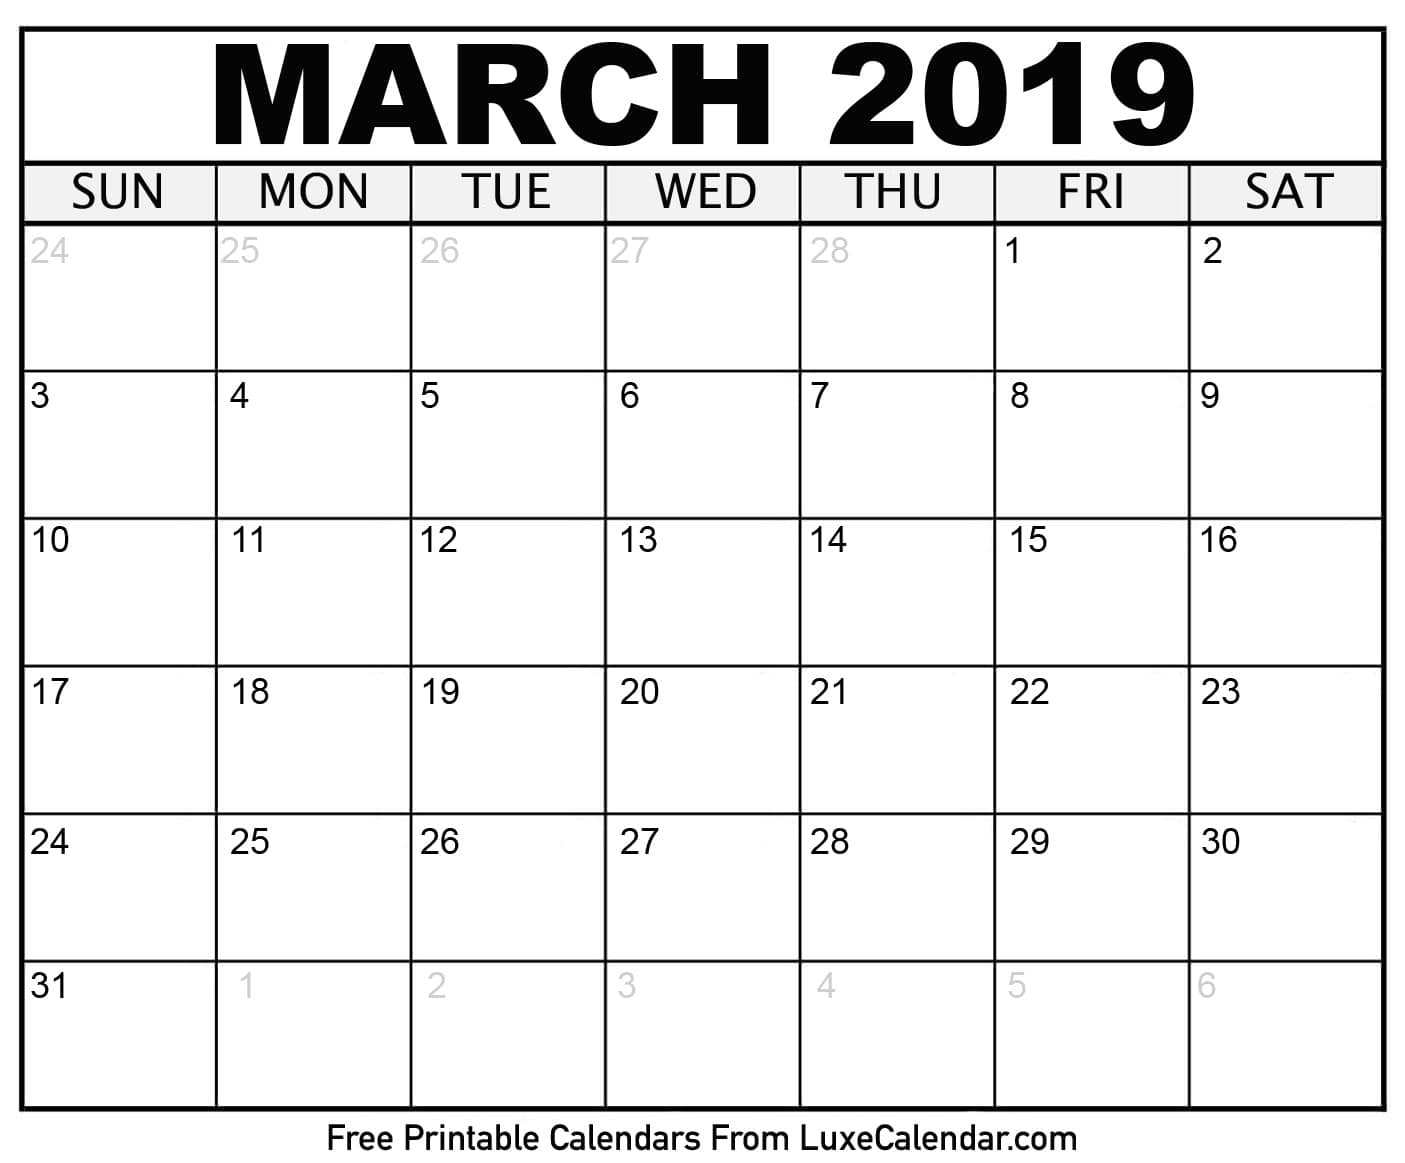 Blank March 2019 Printable Calendar - Luxe Calendar - Free Printable March Activities